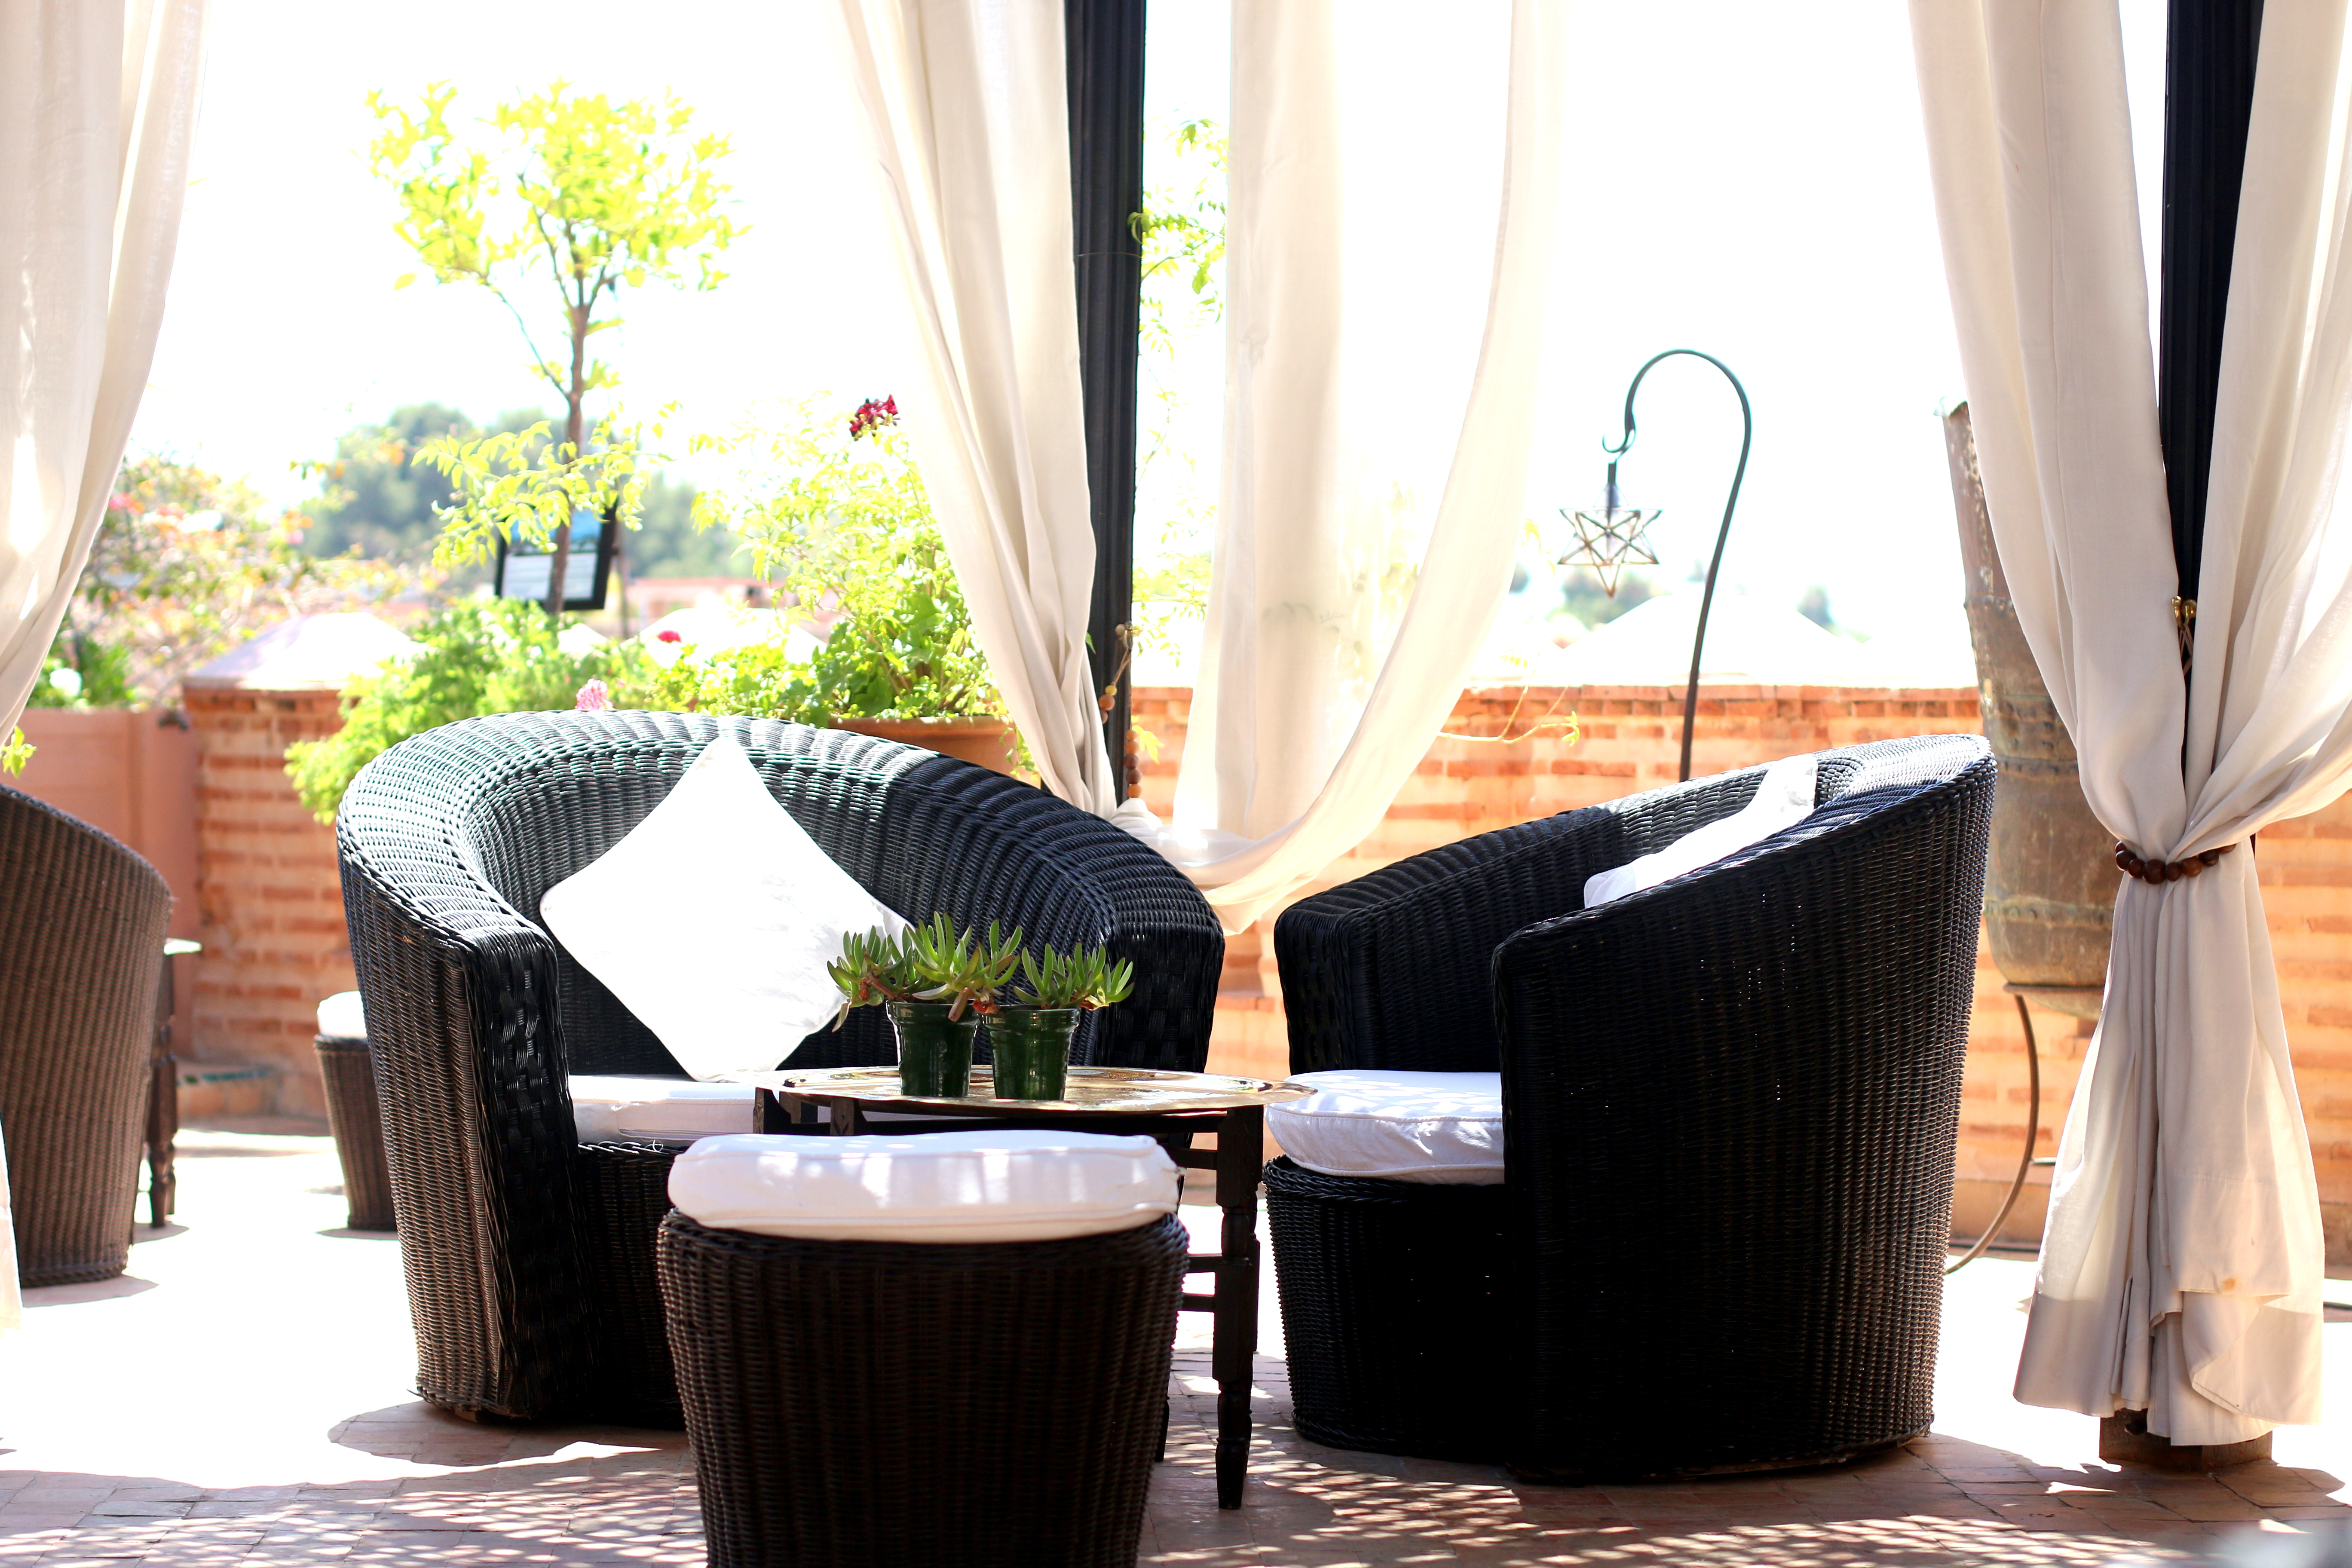 la sultana roofop terrace marrakech hotel travelblog experience